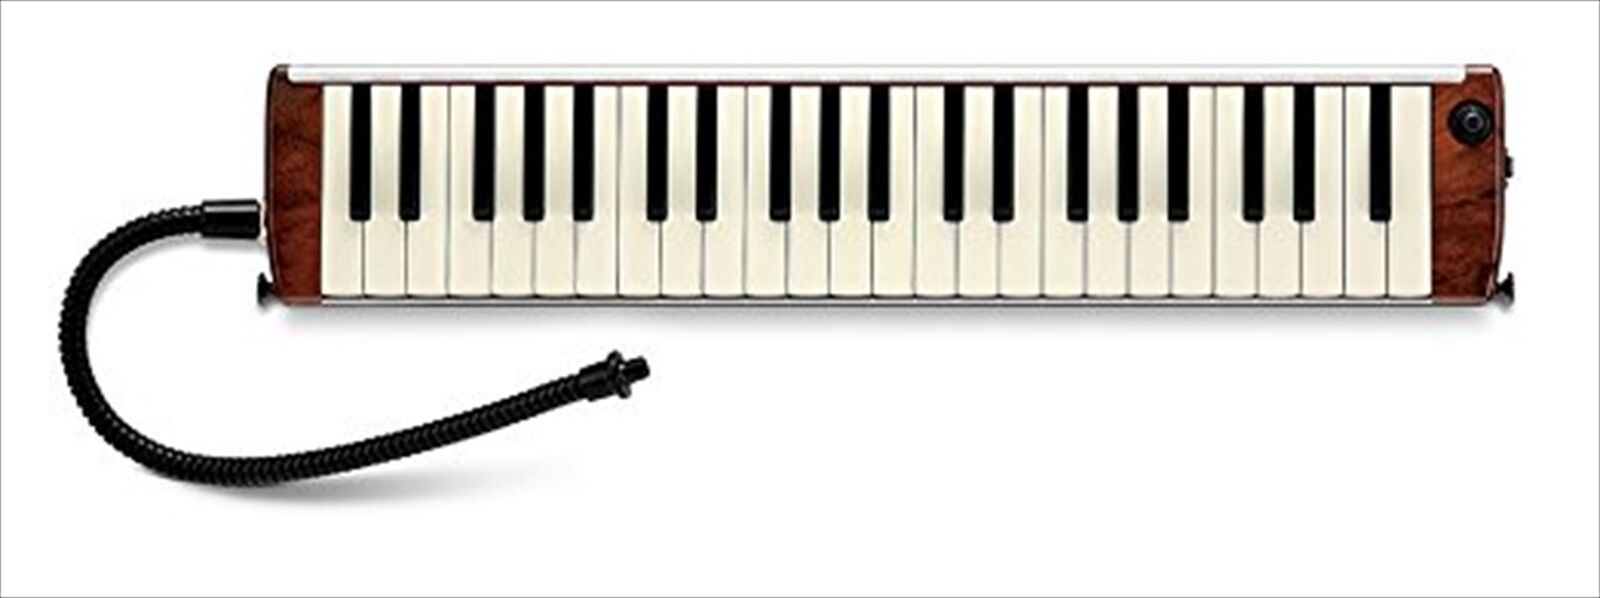 SUZUKI Melodica Hammond PRO-44H NEW Electric Keyboard Recorder F/S  NEW JAPAN